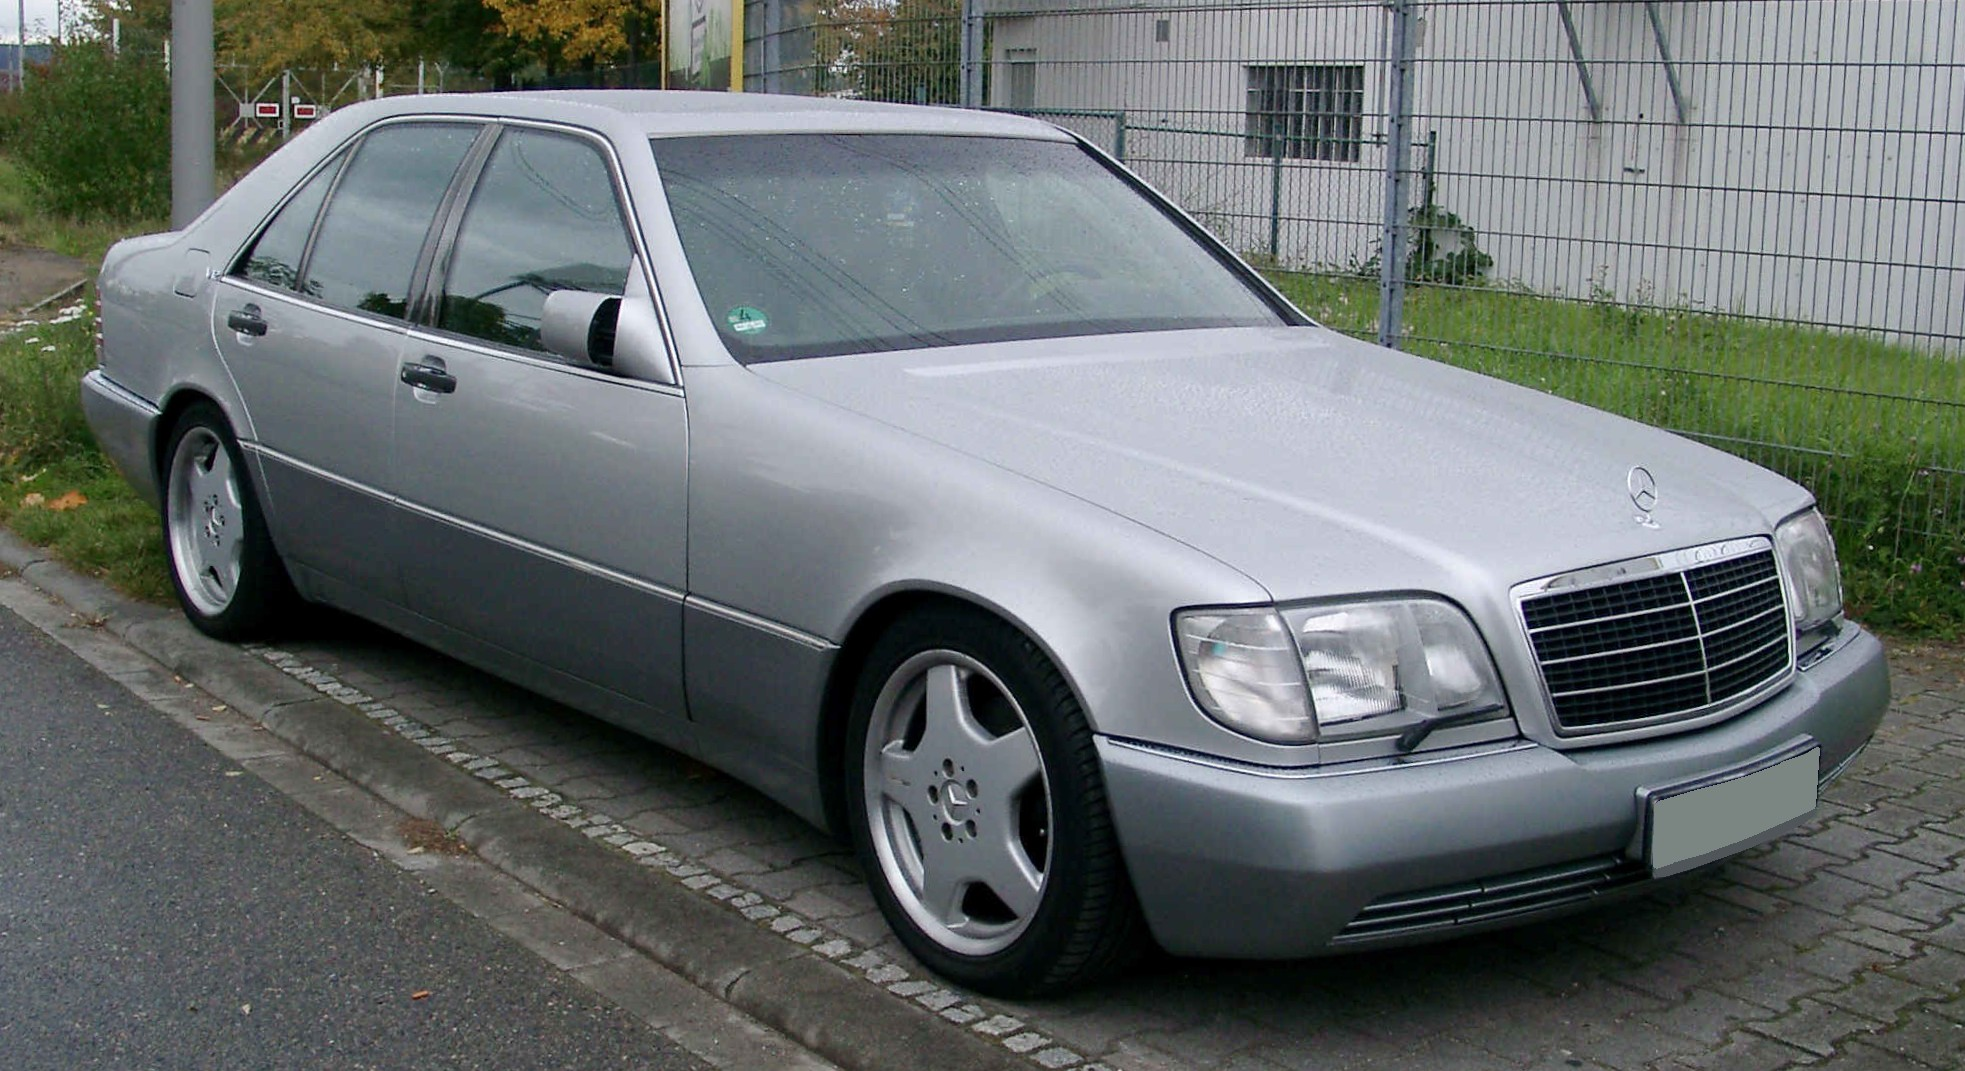 Mercedes Benz W140 front